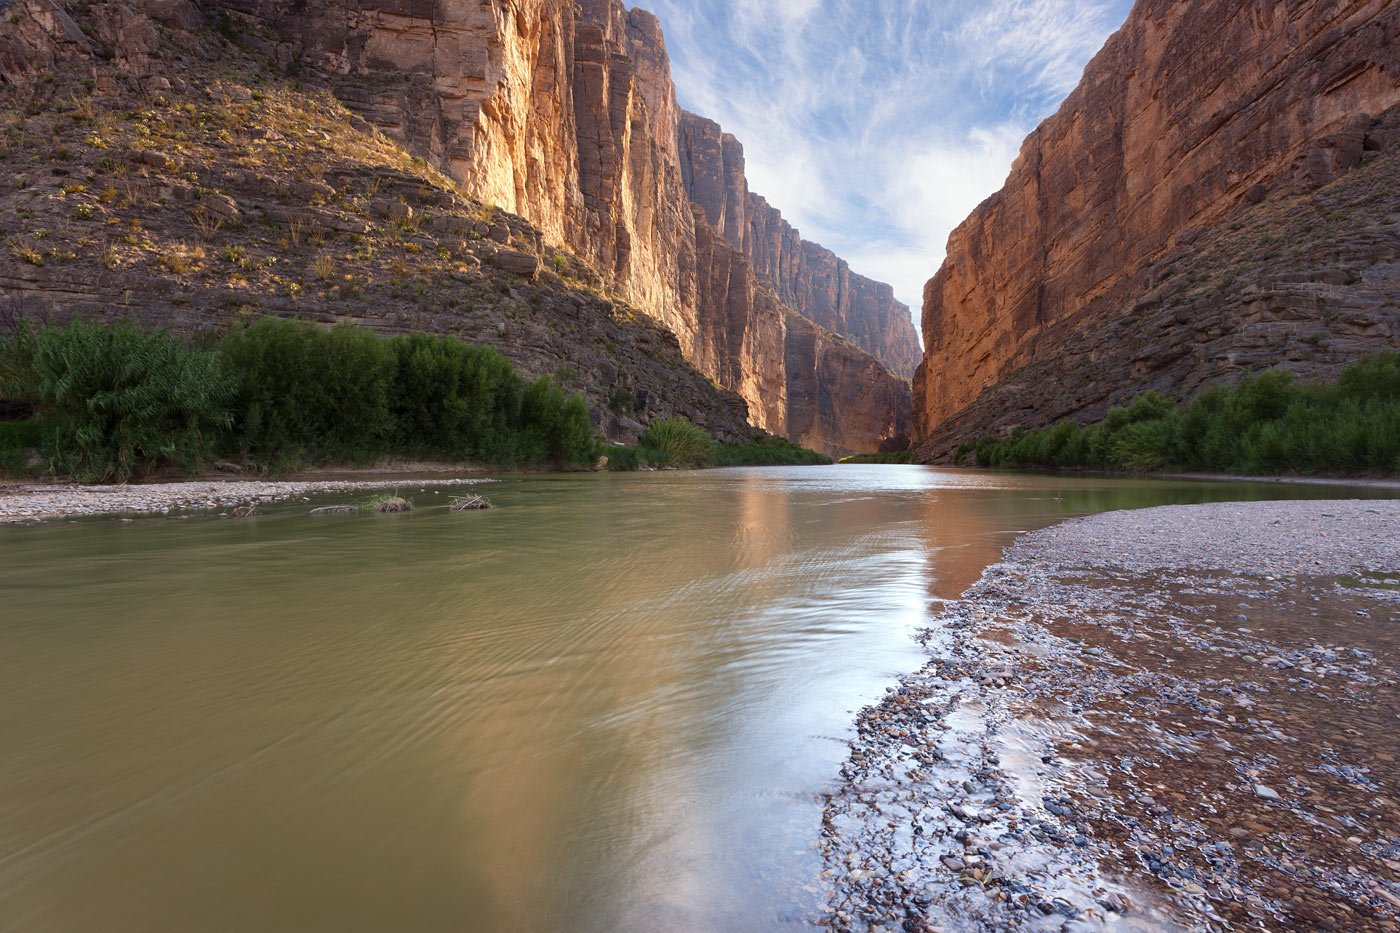 Big-Bend-National-Park-ABP-Santa-Elena-Canyon_Rio-Grande.jpg